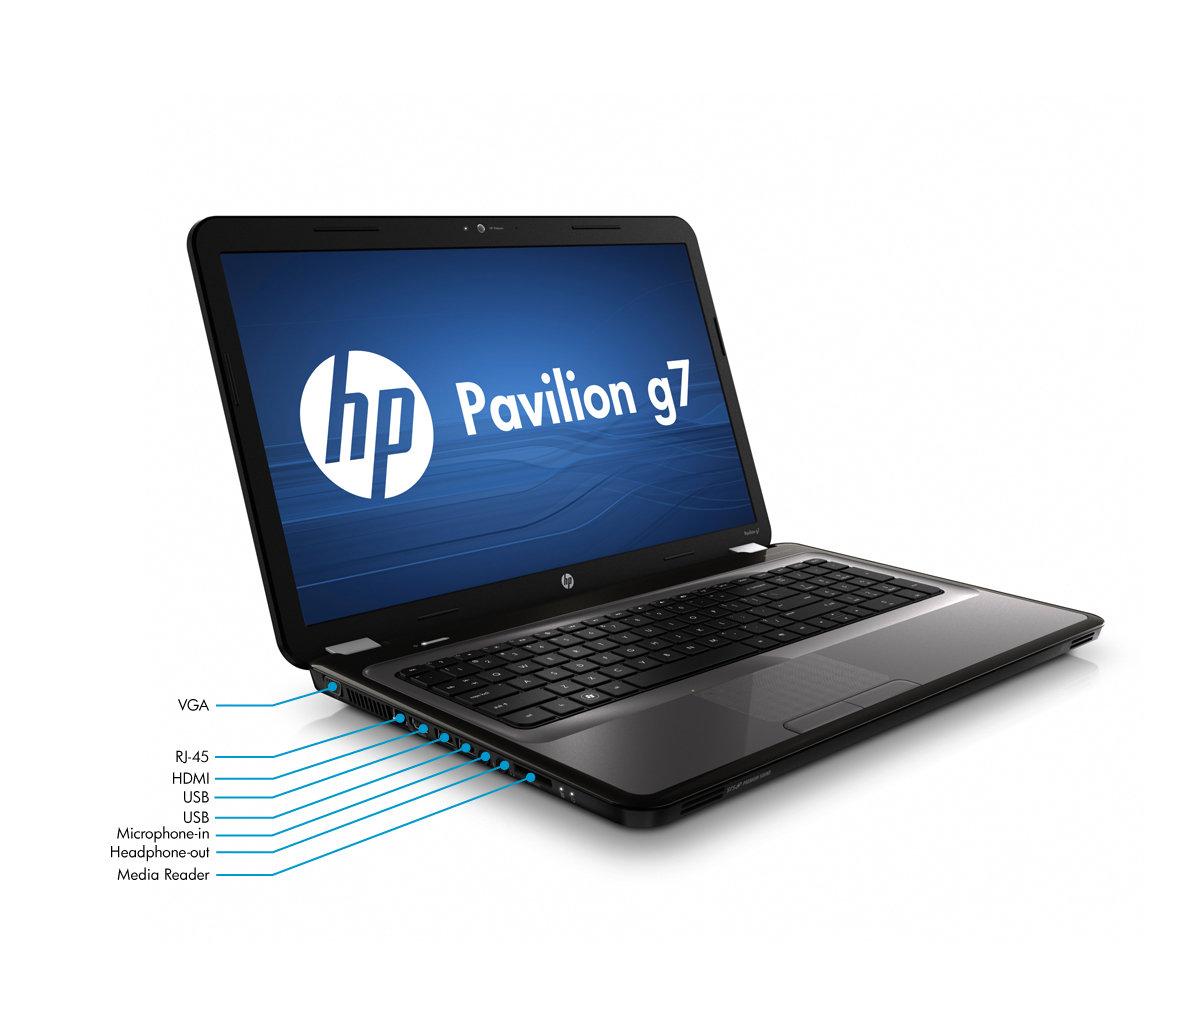 HP Pavilion g7-1272nr Notebook PC Left View